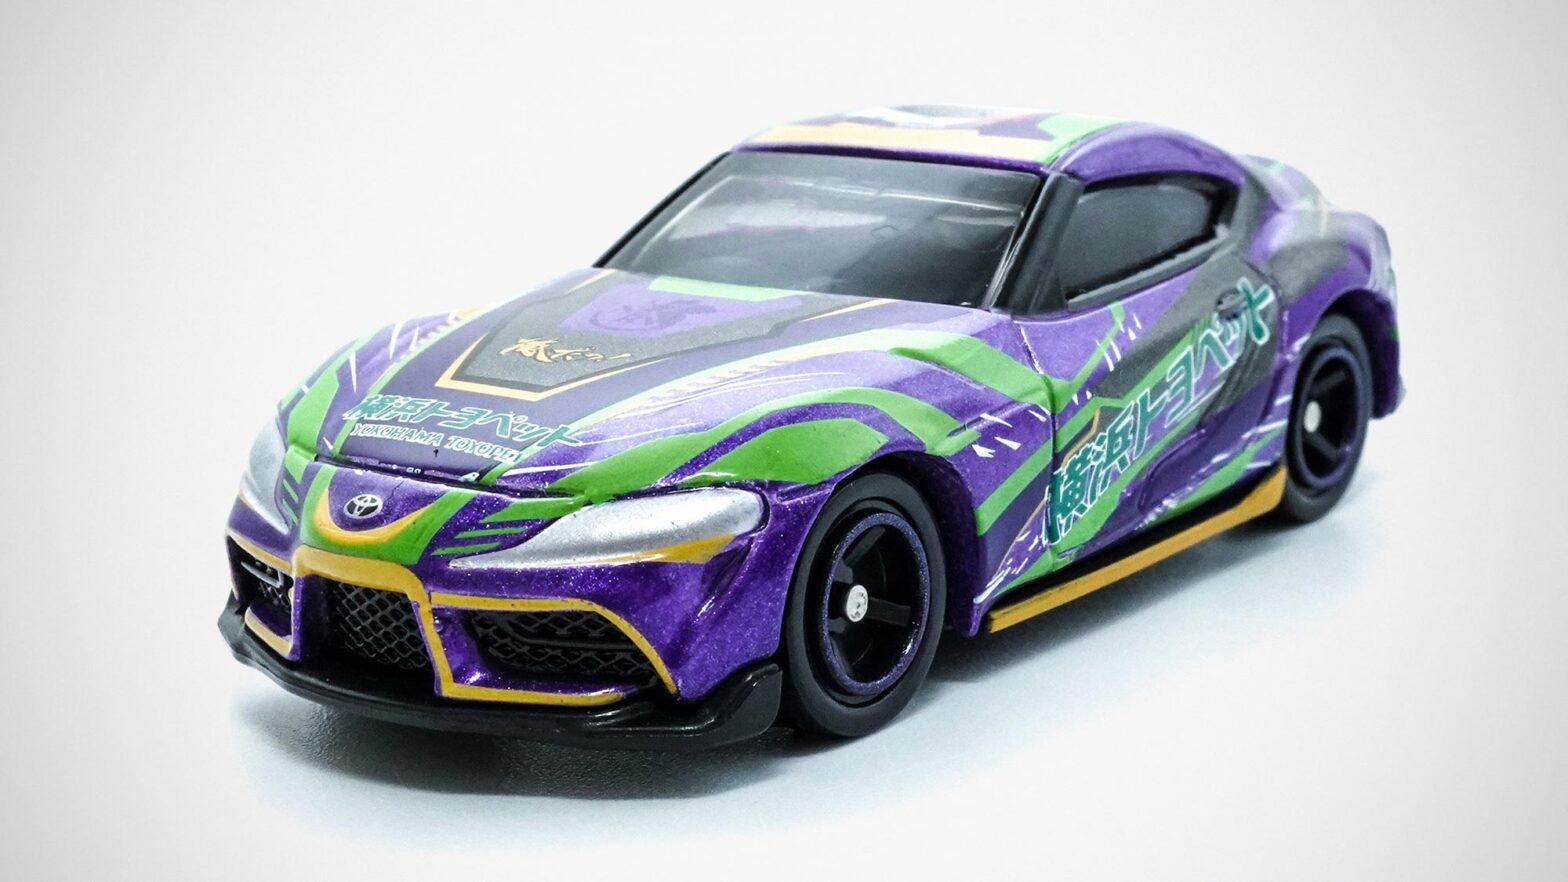 Tomica EVA RT Unit 1 GR Supra Die-cast Toy Car